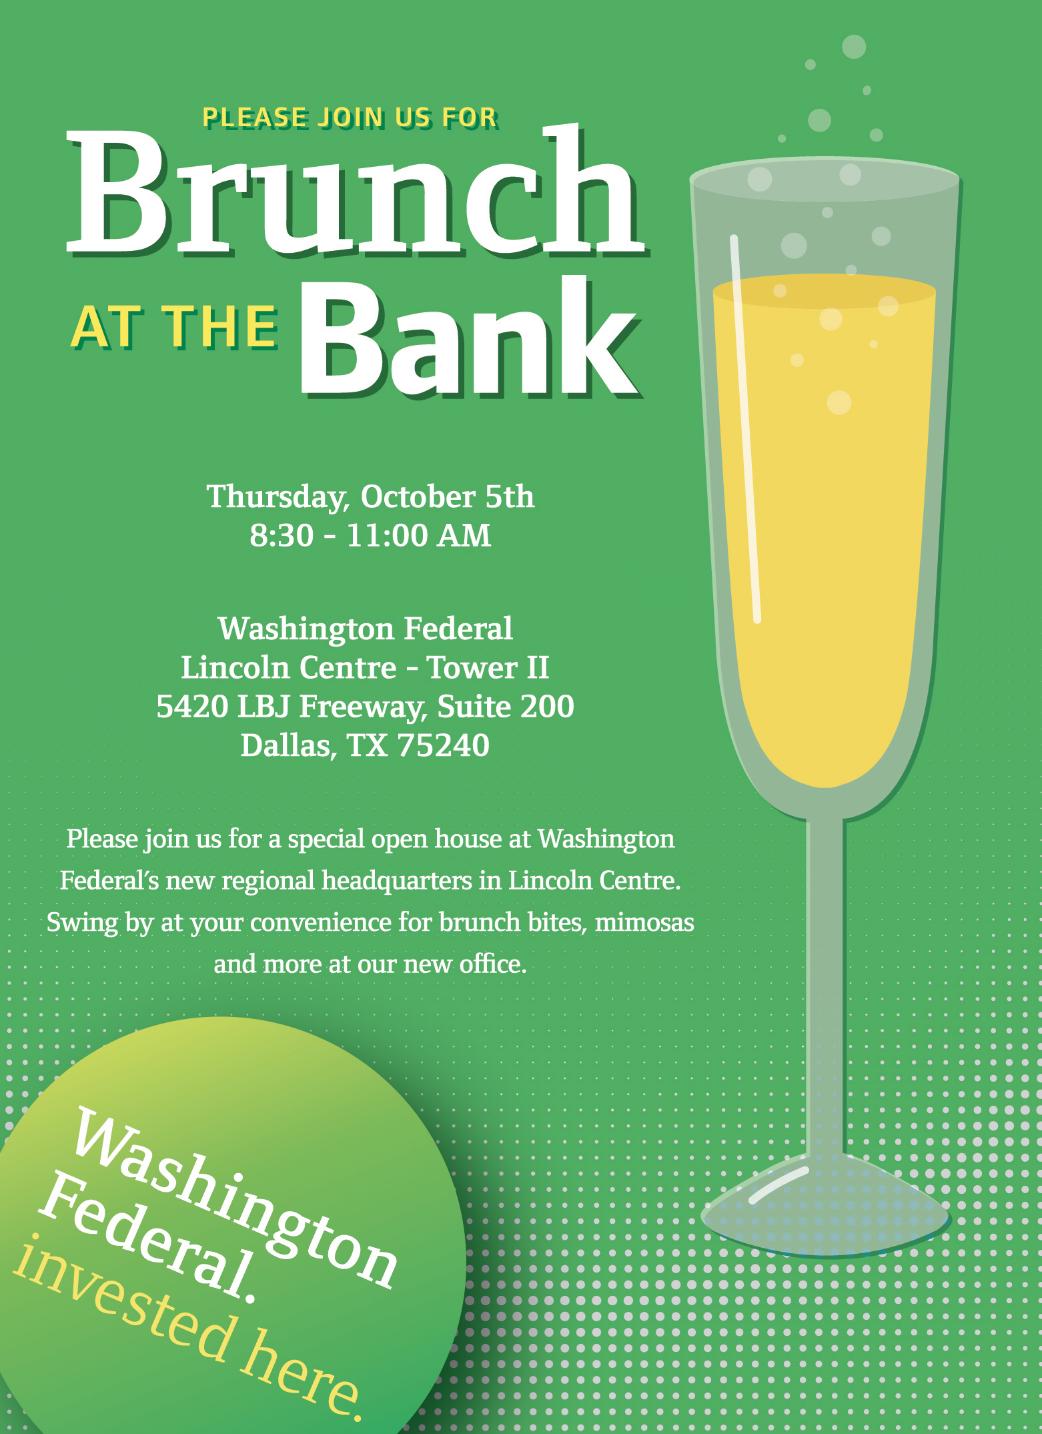 Brunch at the Bank Invitation